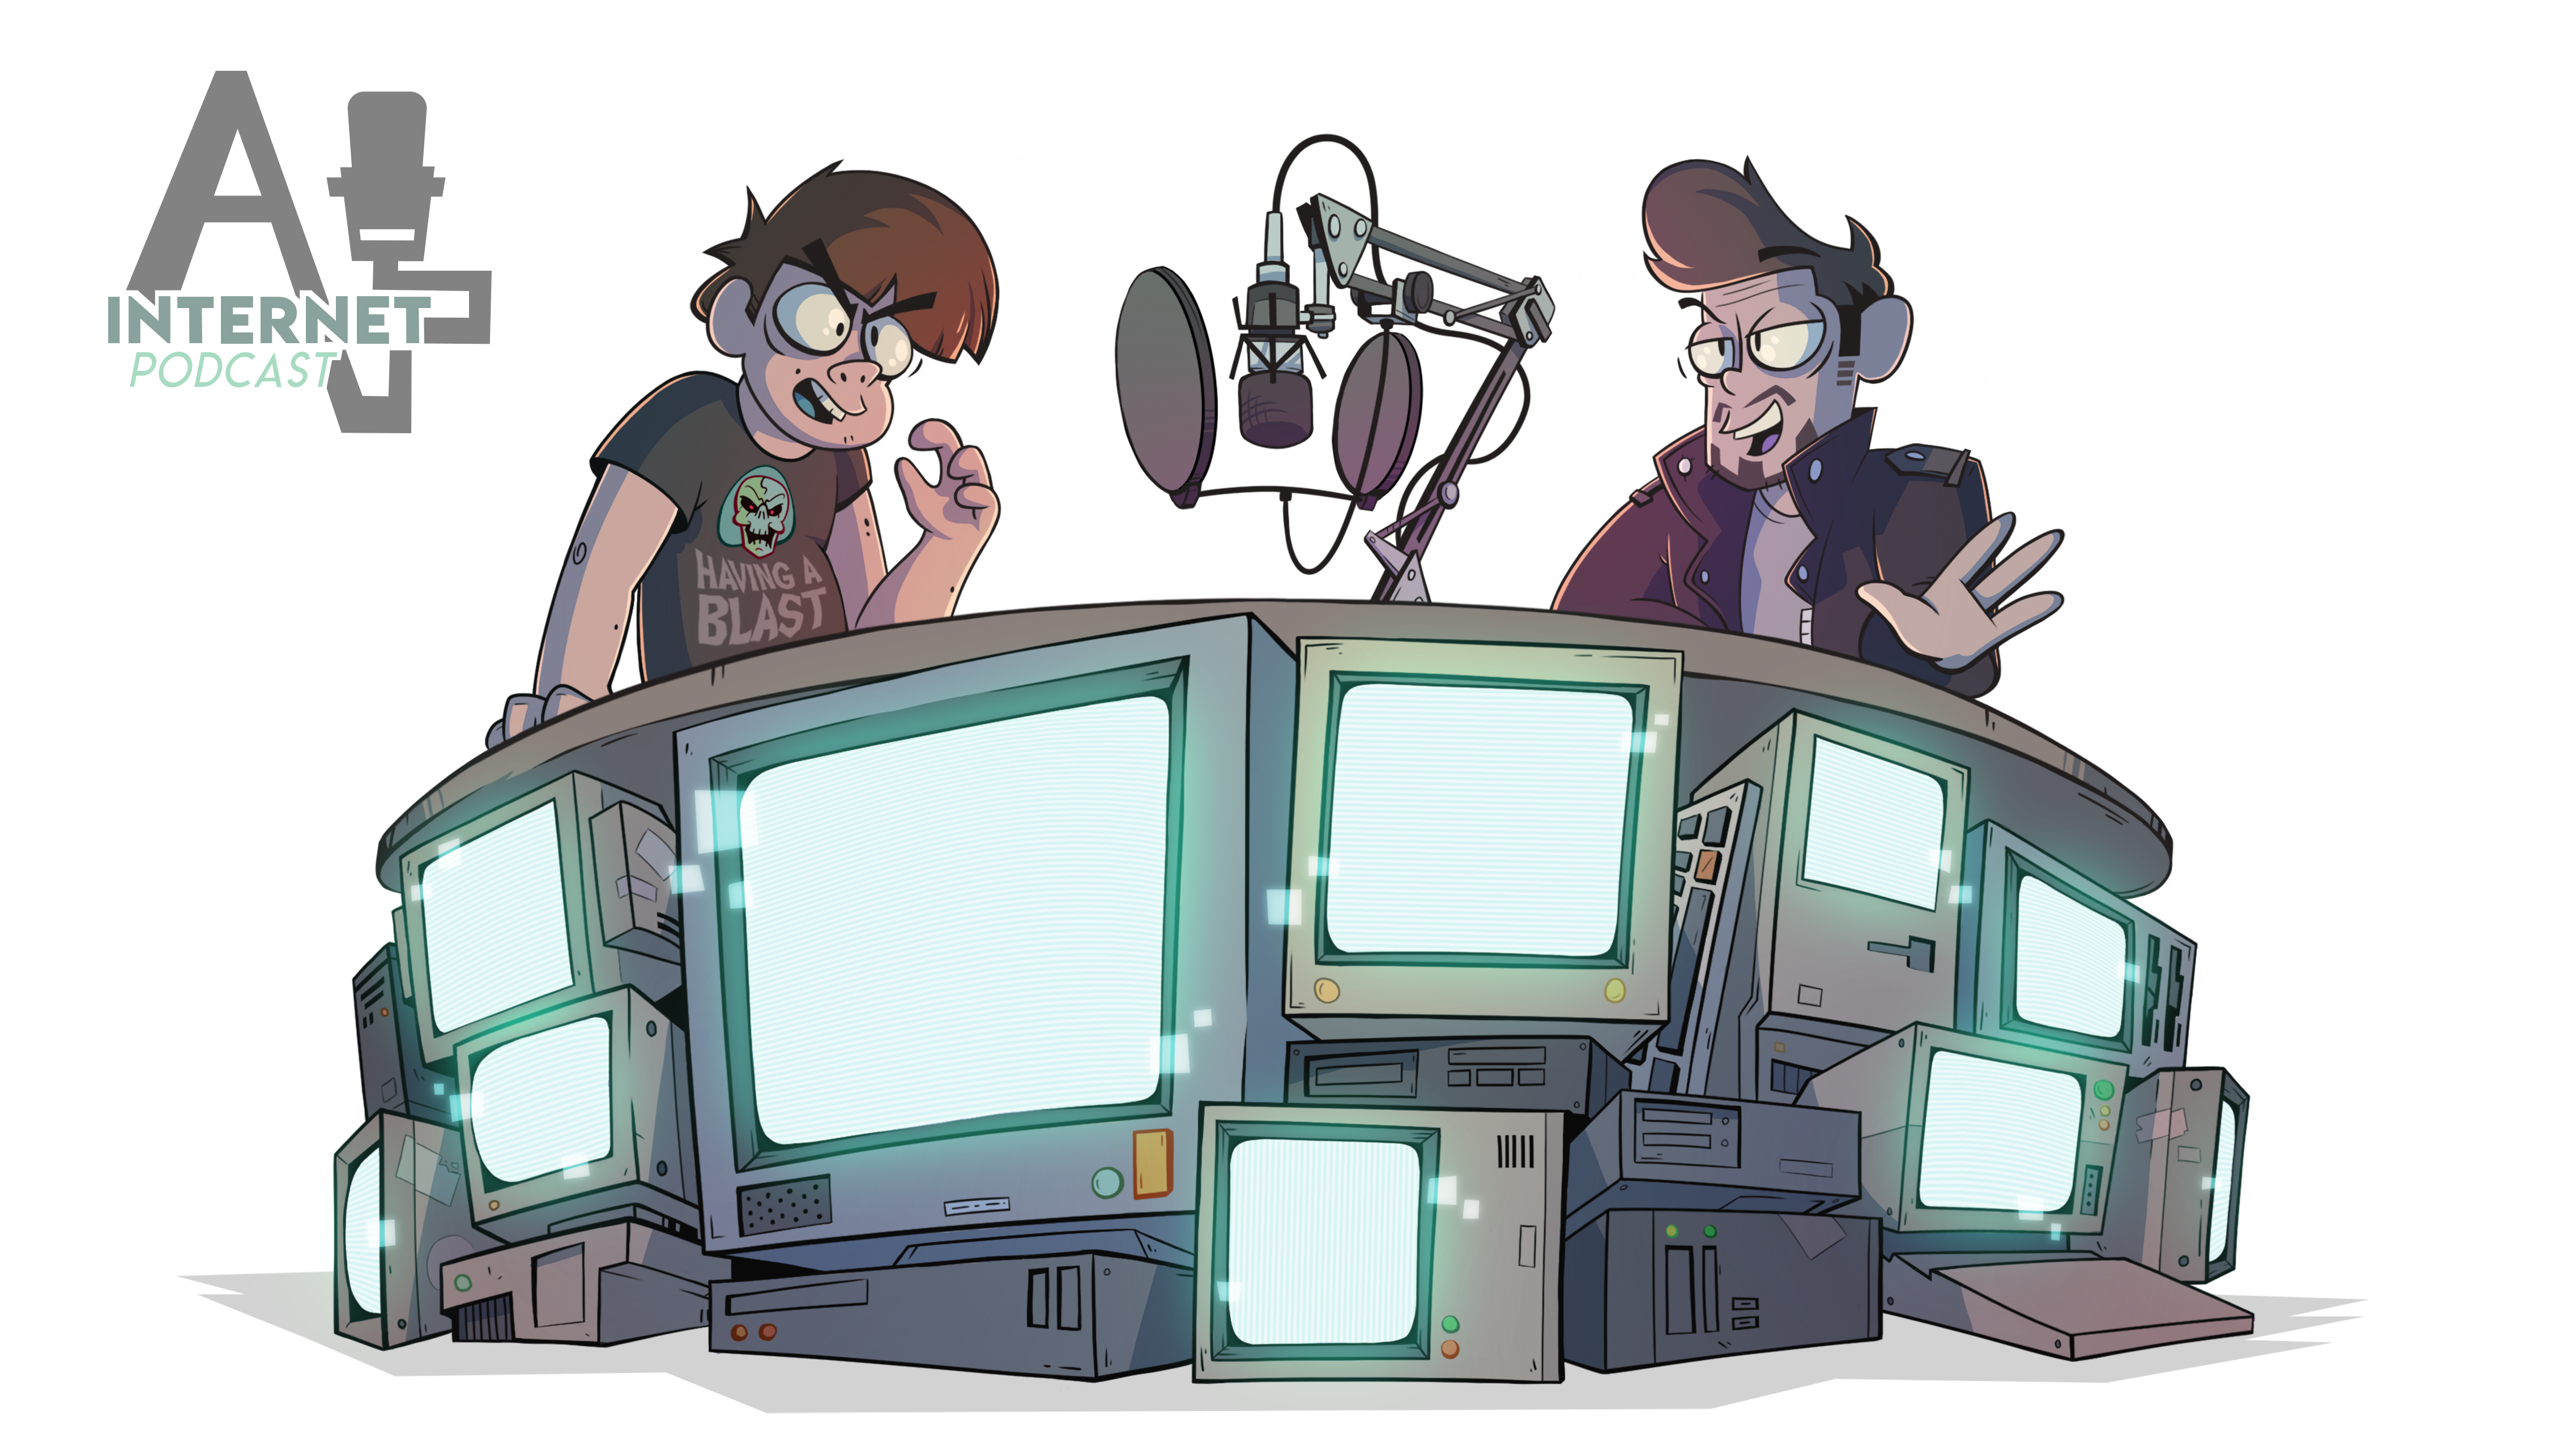 A Internet Podcast